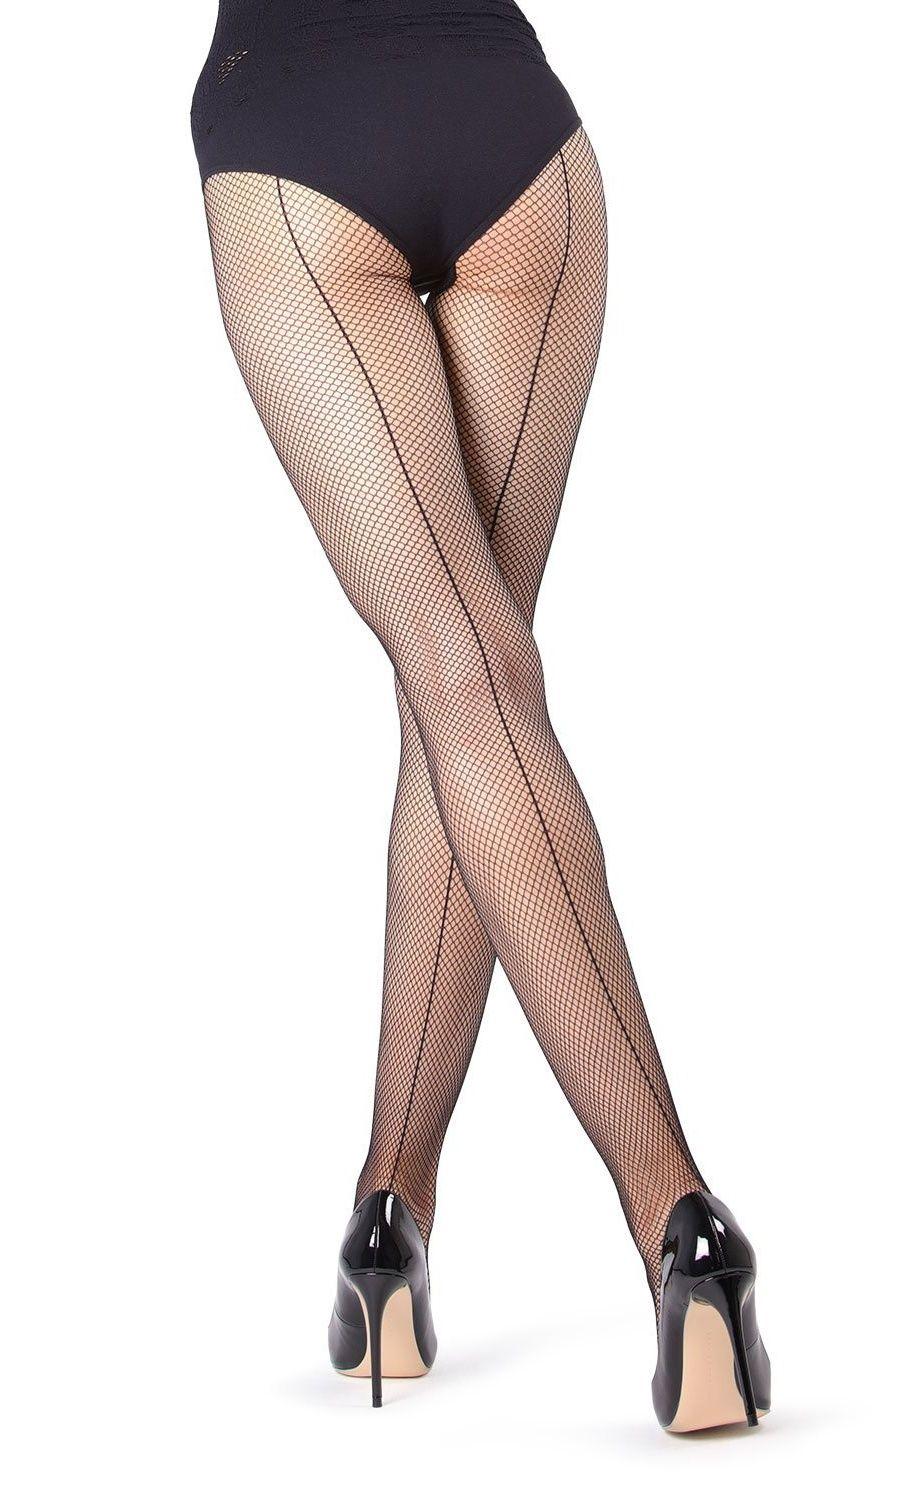 ea61d1ff00a MeMoi Backseam Fishnet Tights- Nice Sexy Tights for Women by MeMoi  Medium Large   Black MO 337 Tights